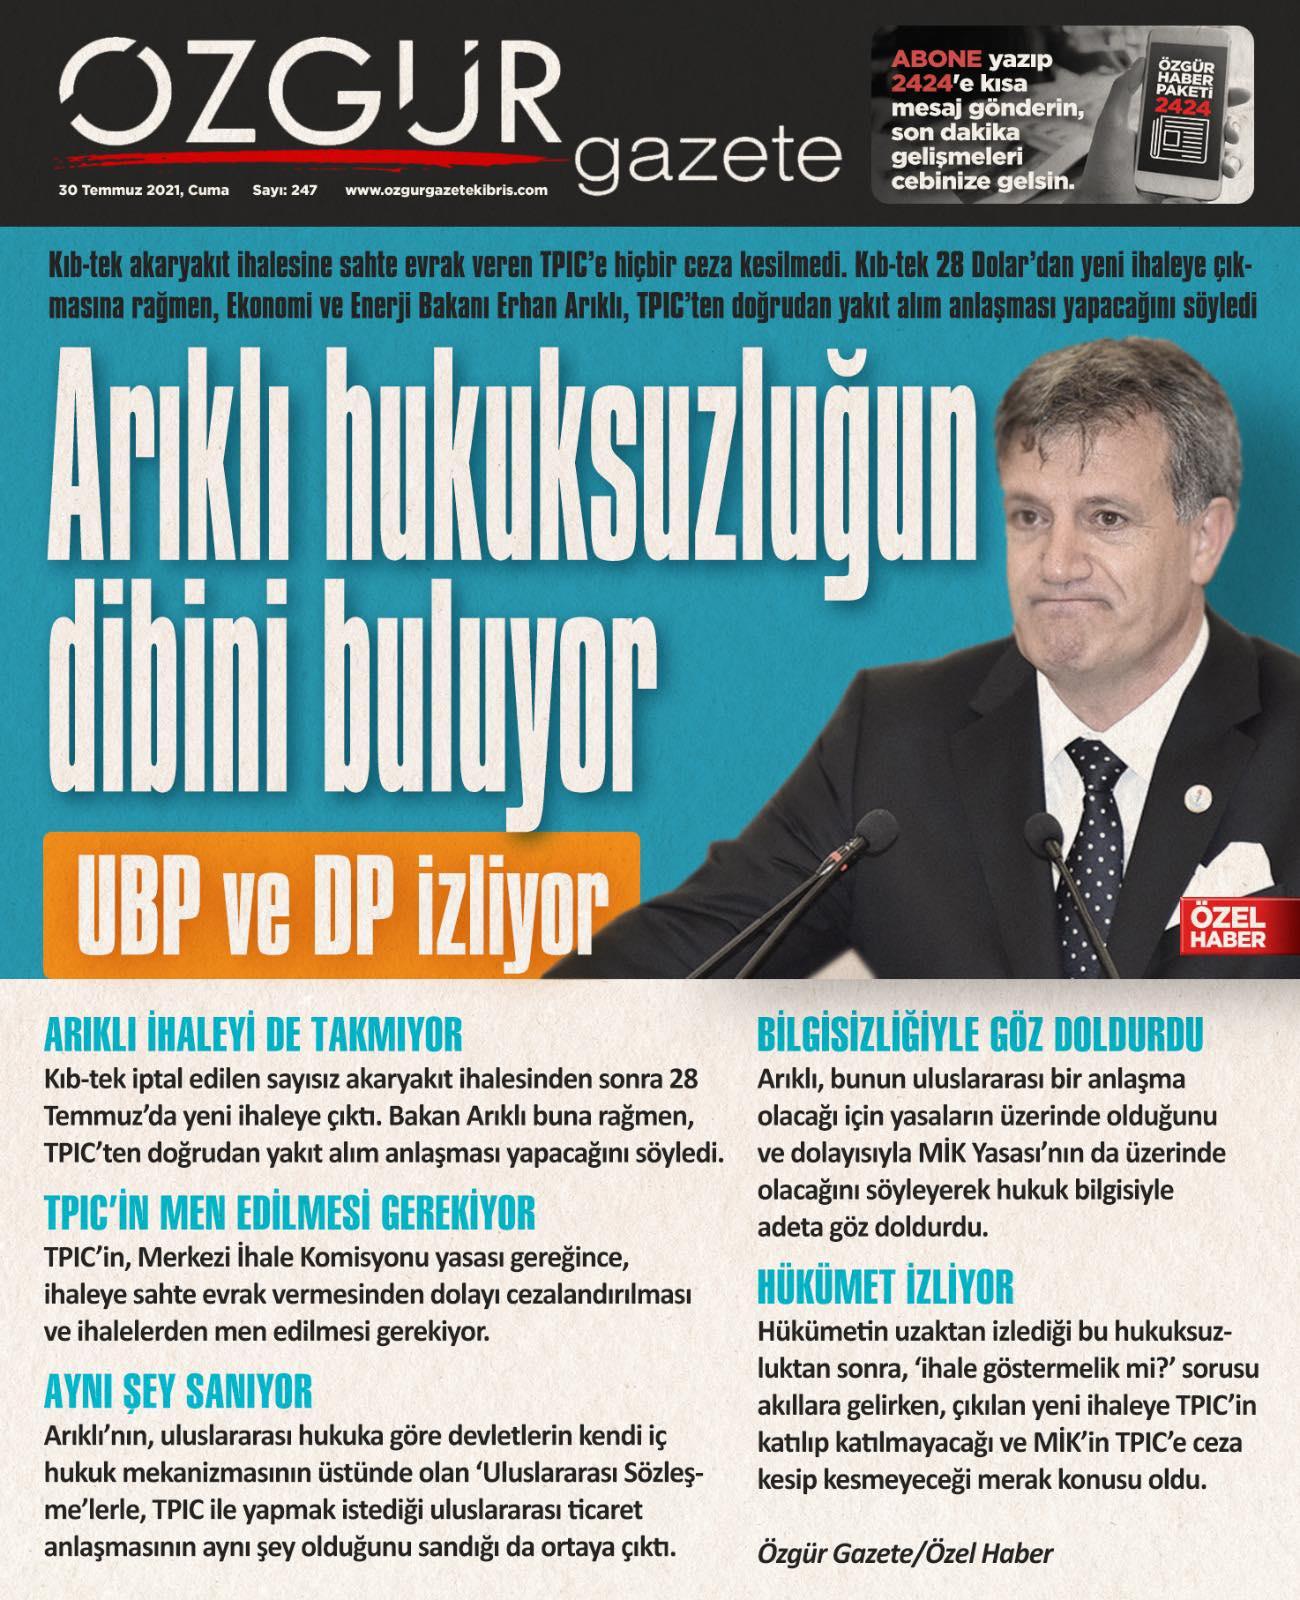 ozgur_gazete_kibris_manşet_arıklı